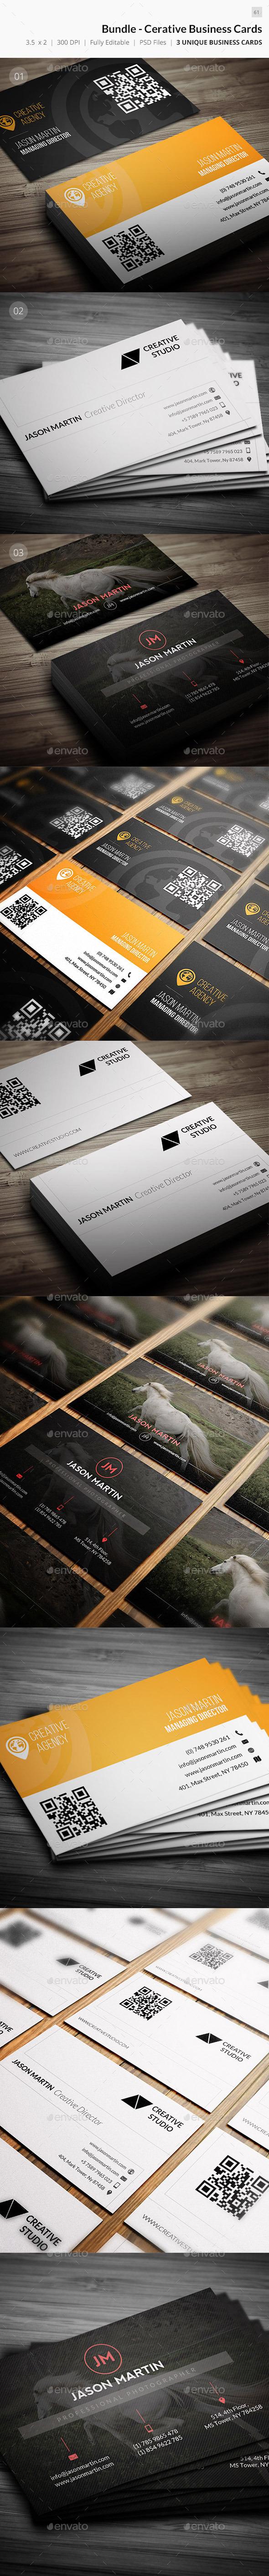 Bundle - Creative Business Cards - 61 - Creative Business Cards